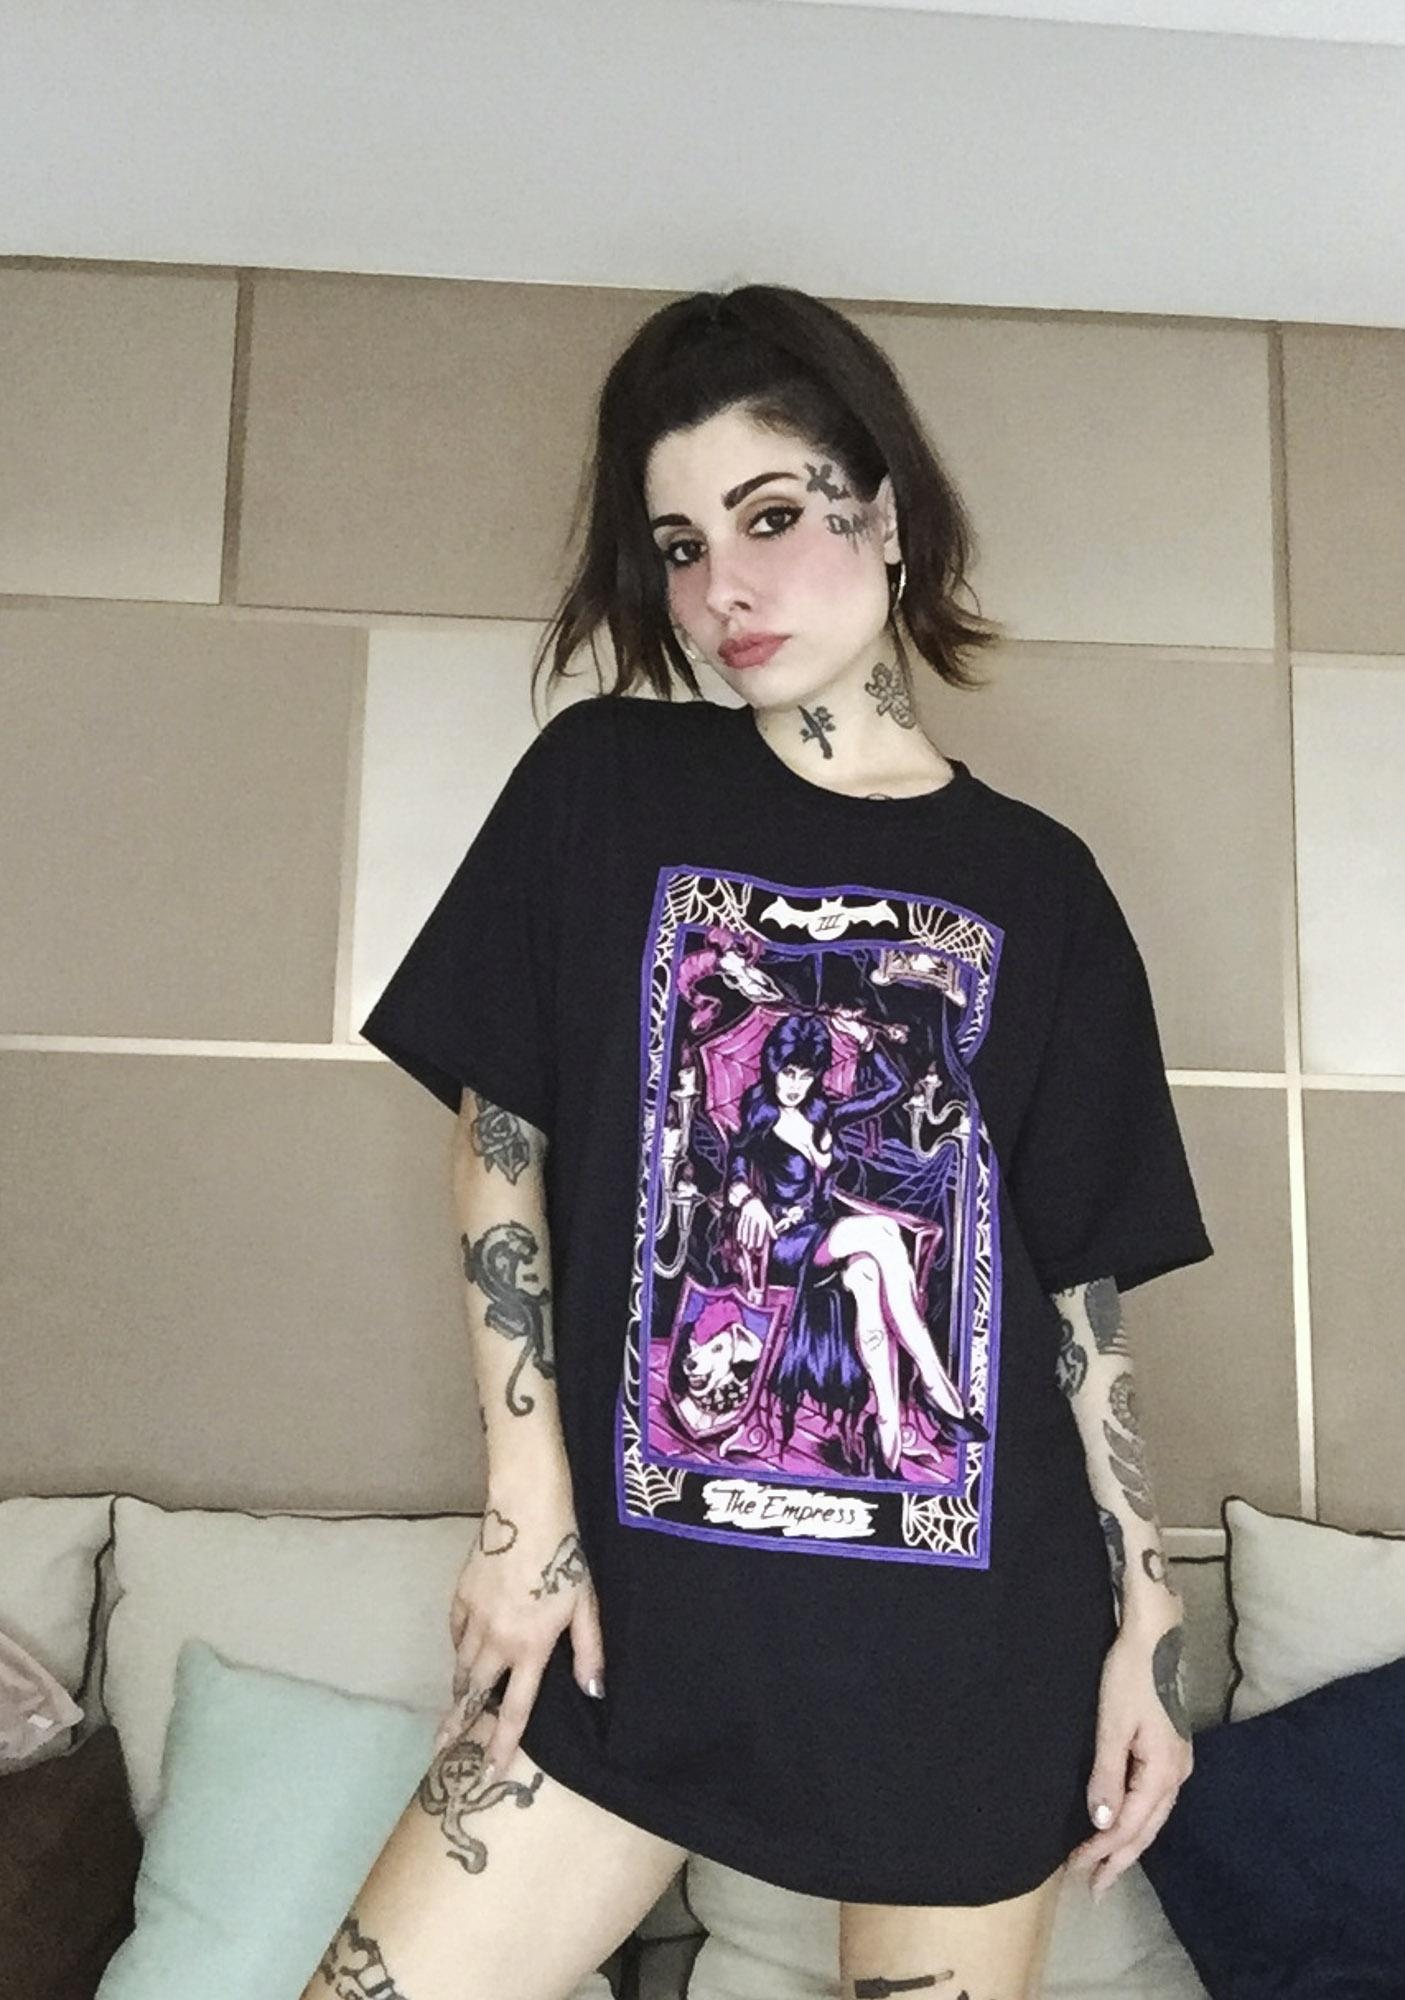 Camiseta The Empress